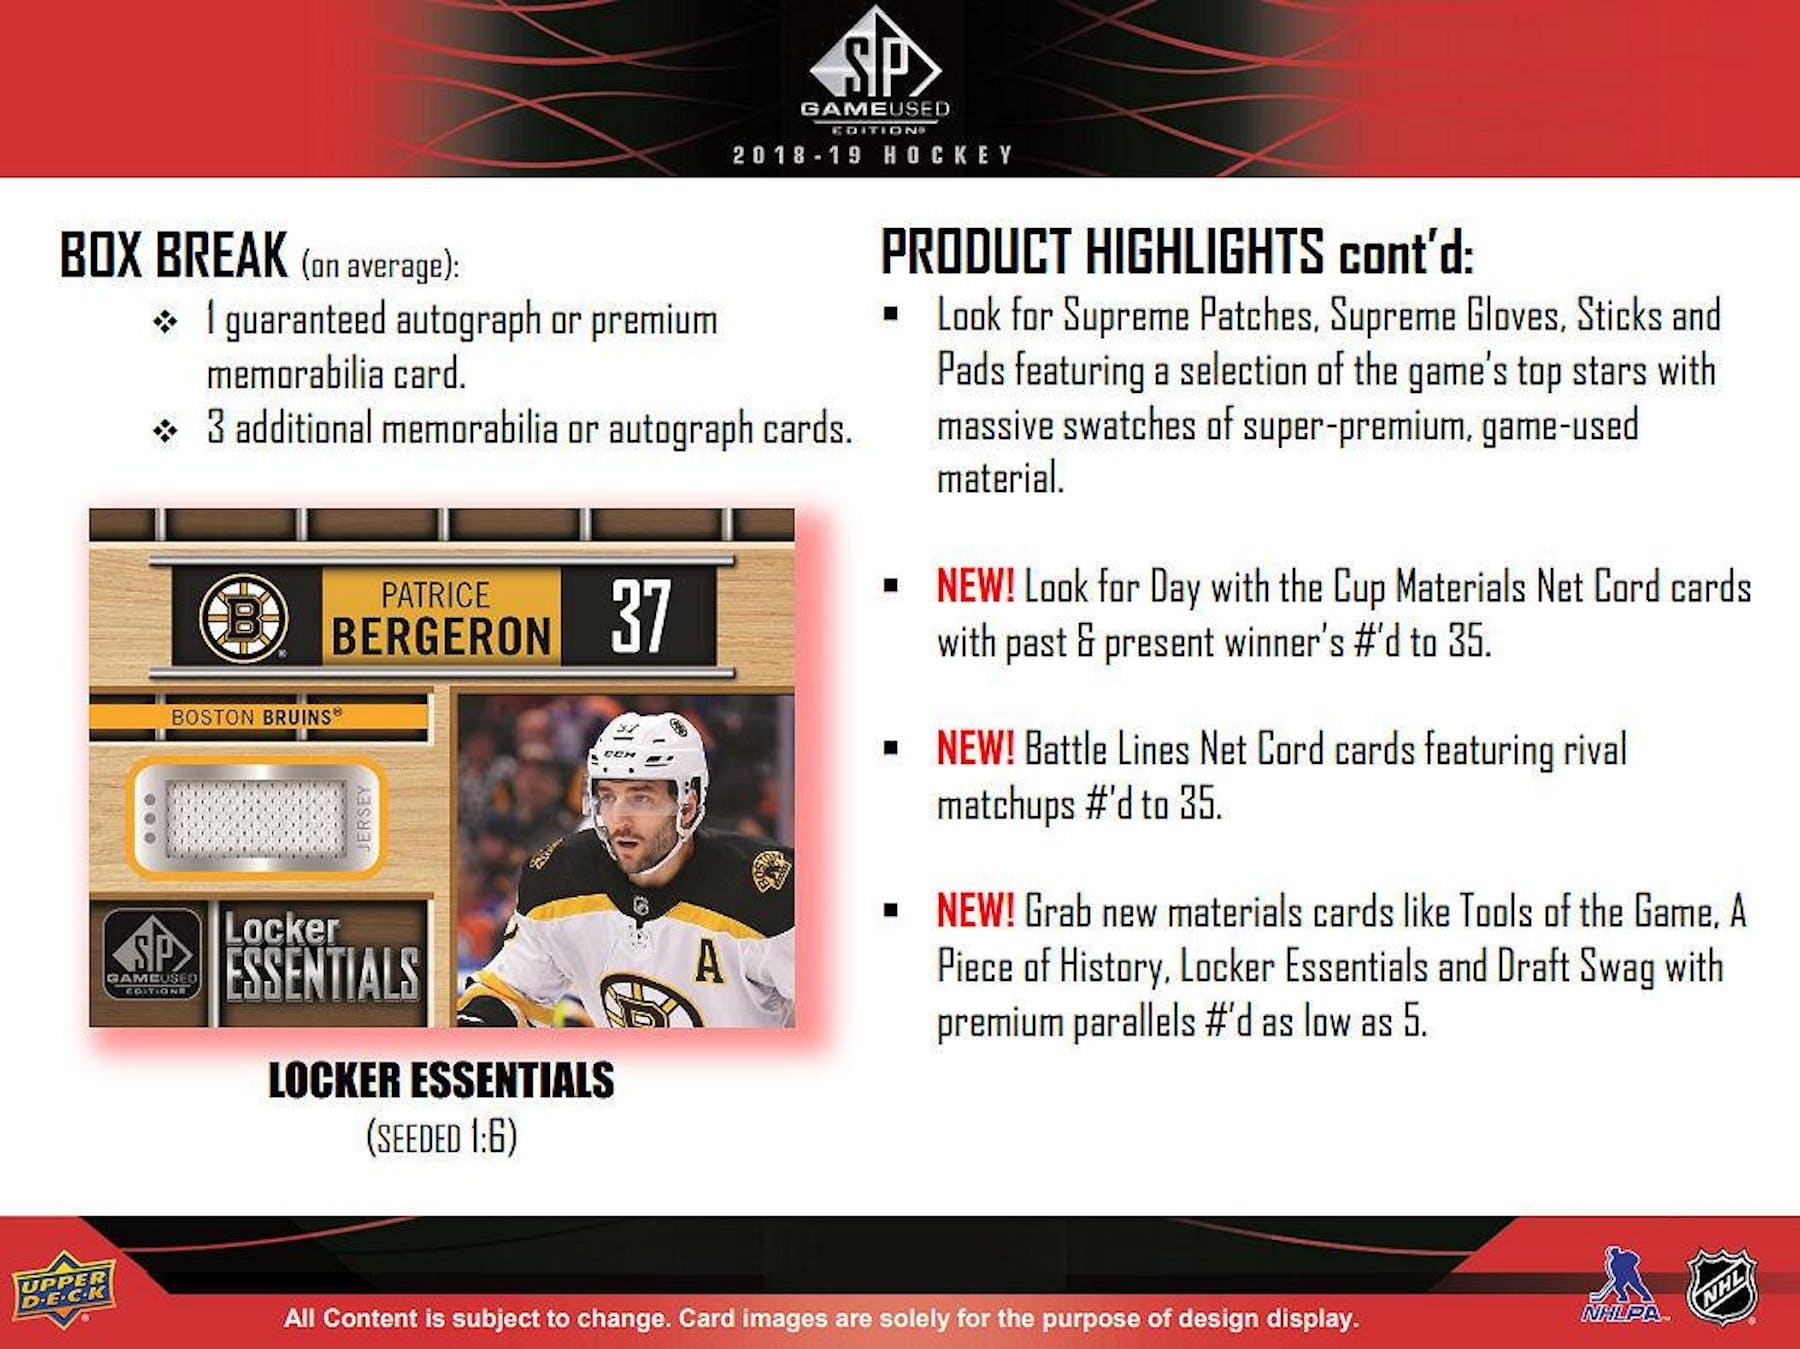 afc1ad8ff38 2018 19 Upper Deck SP Game Used Hockey Hobby Box ...